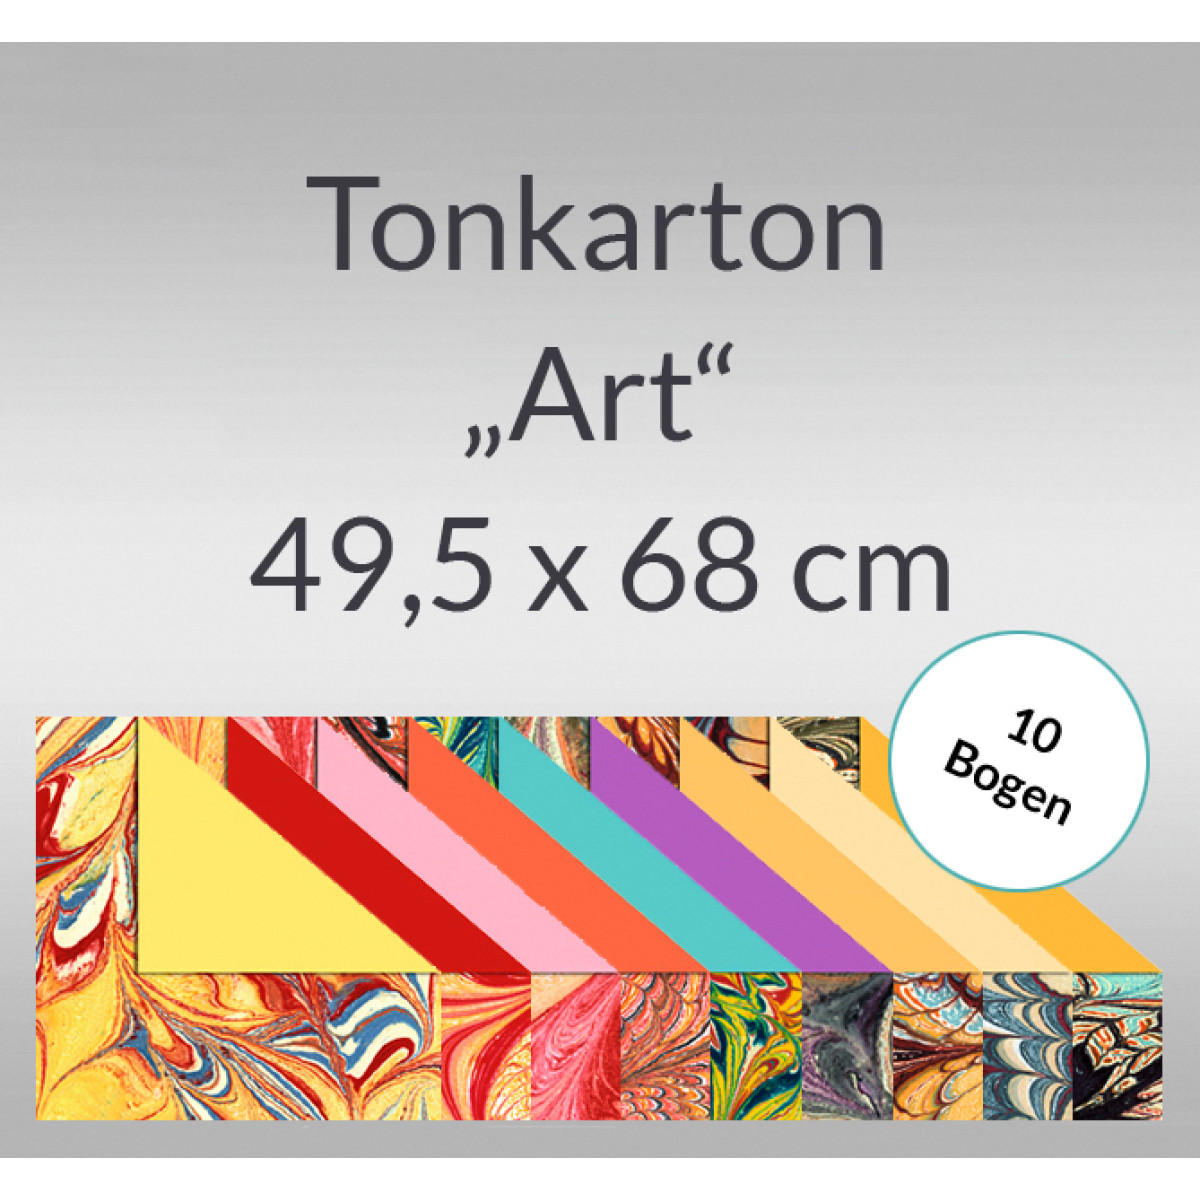 "Tonkarton ""Art"" 220 g/qm 49,5 x 68 cm - 10 Bogen"